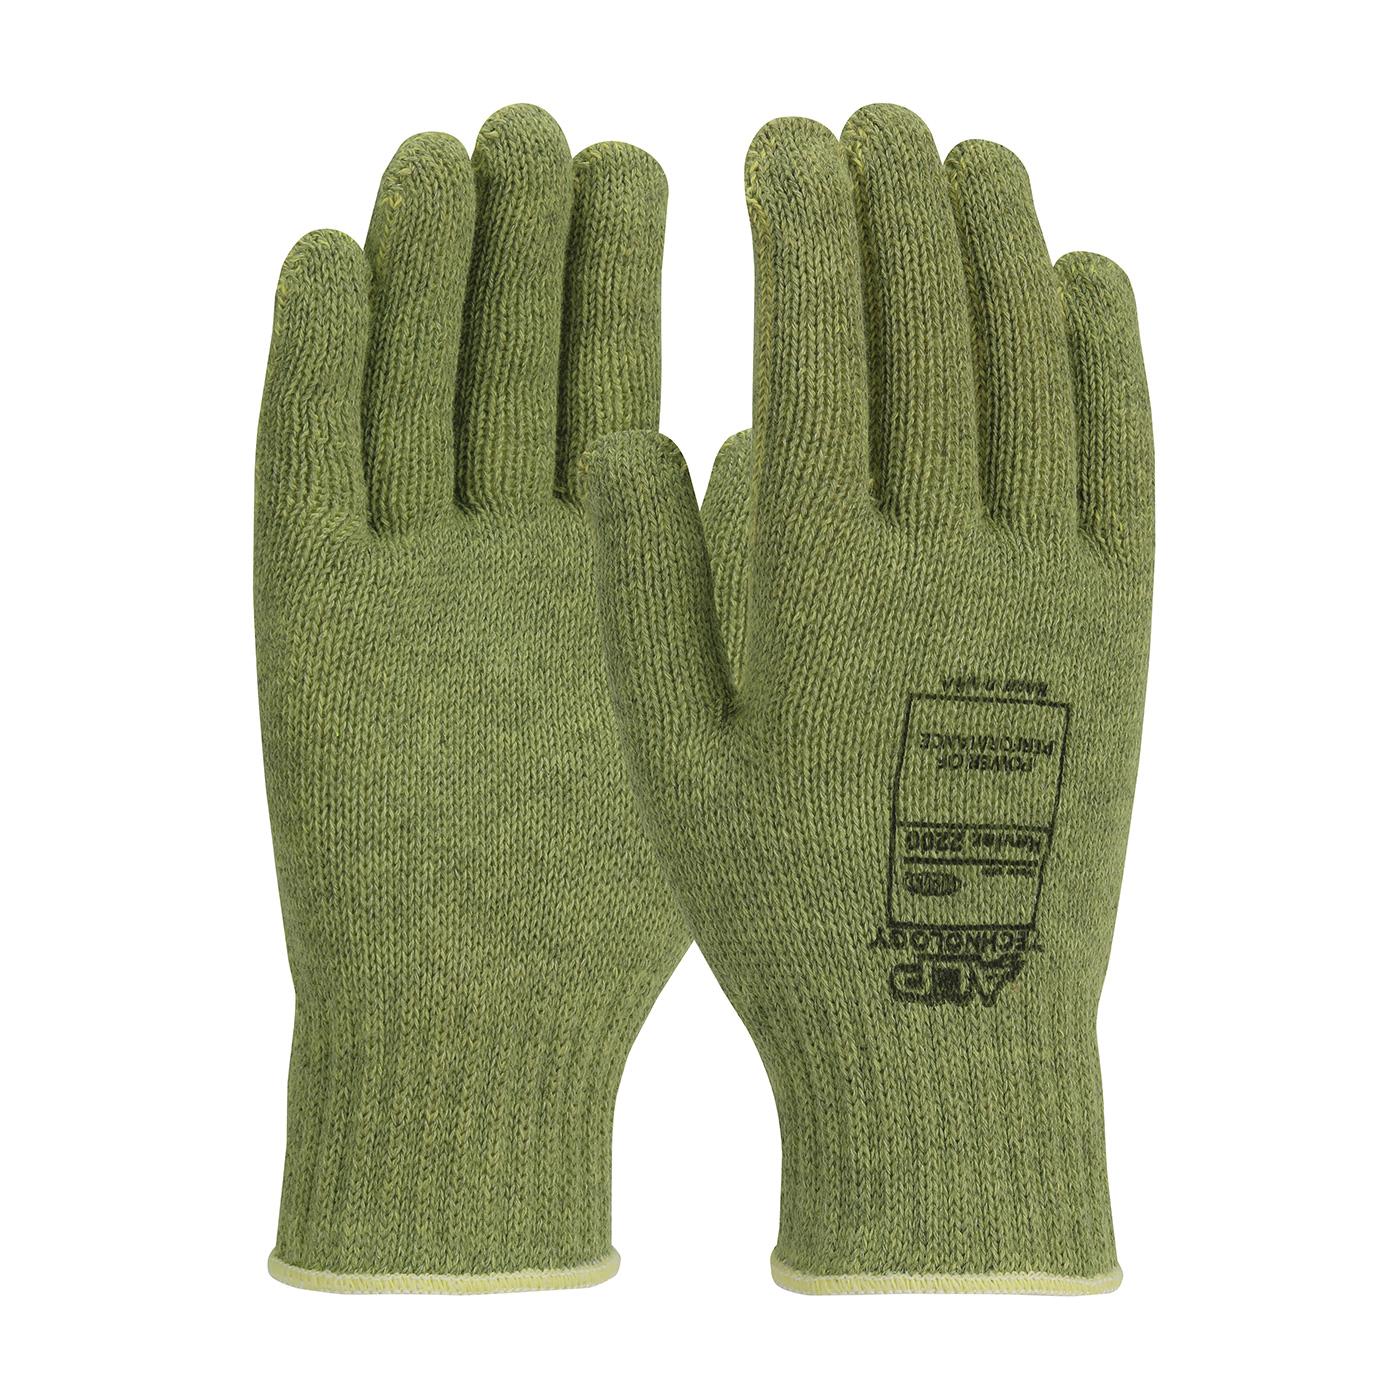 PIP® ACP Technology™ 07-KA710/L Medium Weight Unisex Cut Resistant Gloves, L, ACP/Kevlar®, Elastic/Knit Wrist Cuff, Resists: Abrasion, Cut, Fatigue and Heat, ANSI Cut-Resistance Level: A4